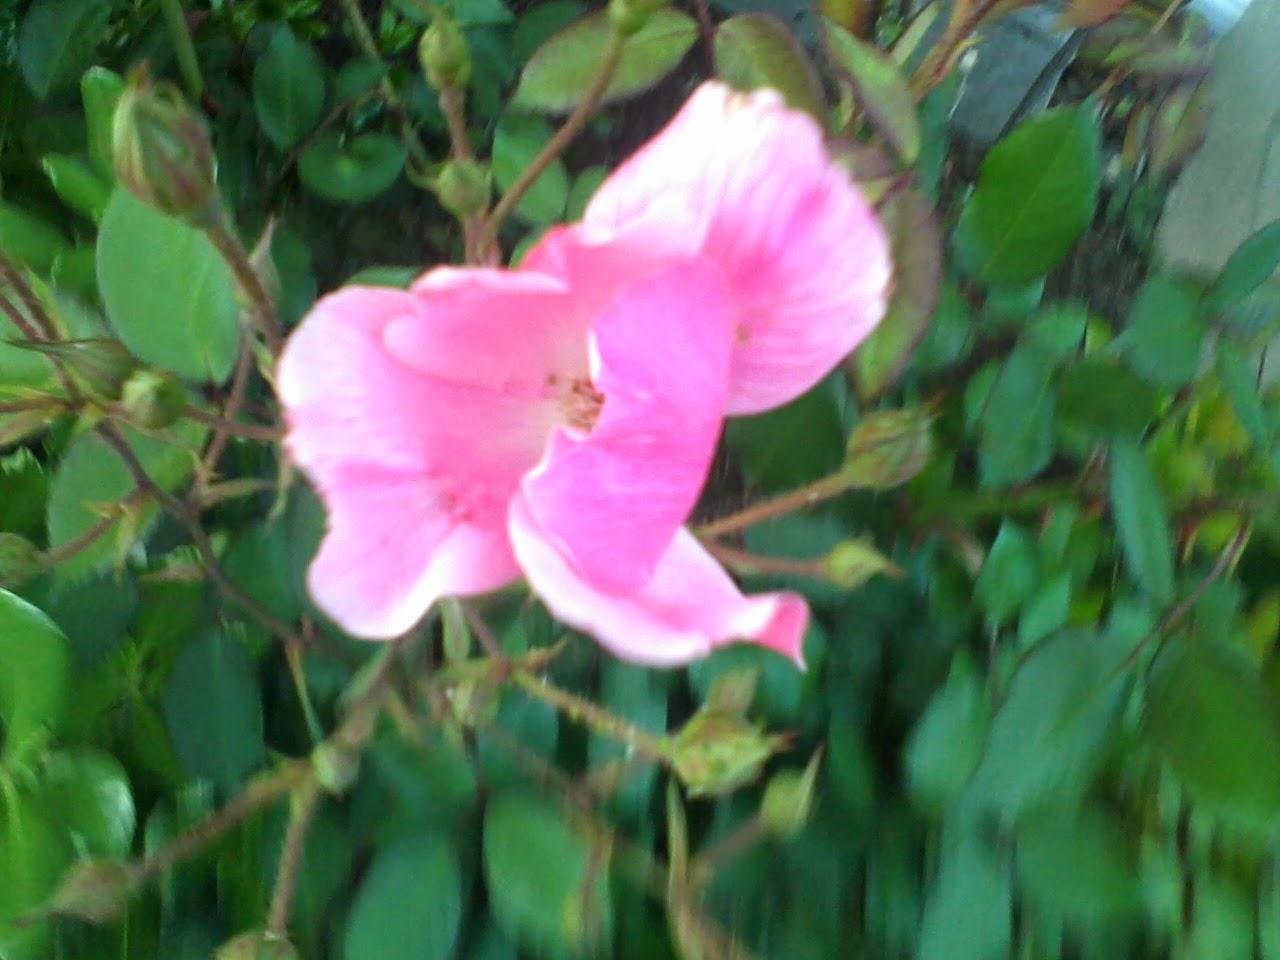 Gardening 2014 - 0411192040.jpg